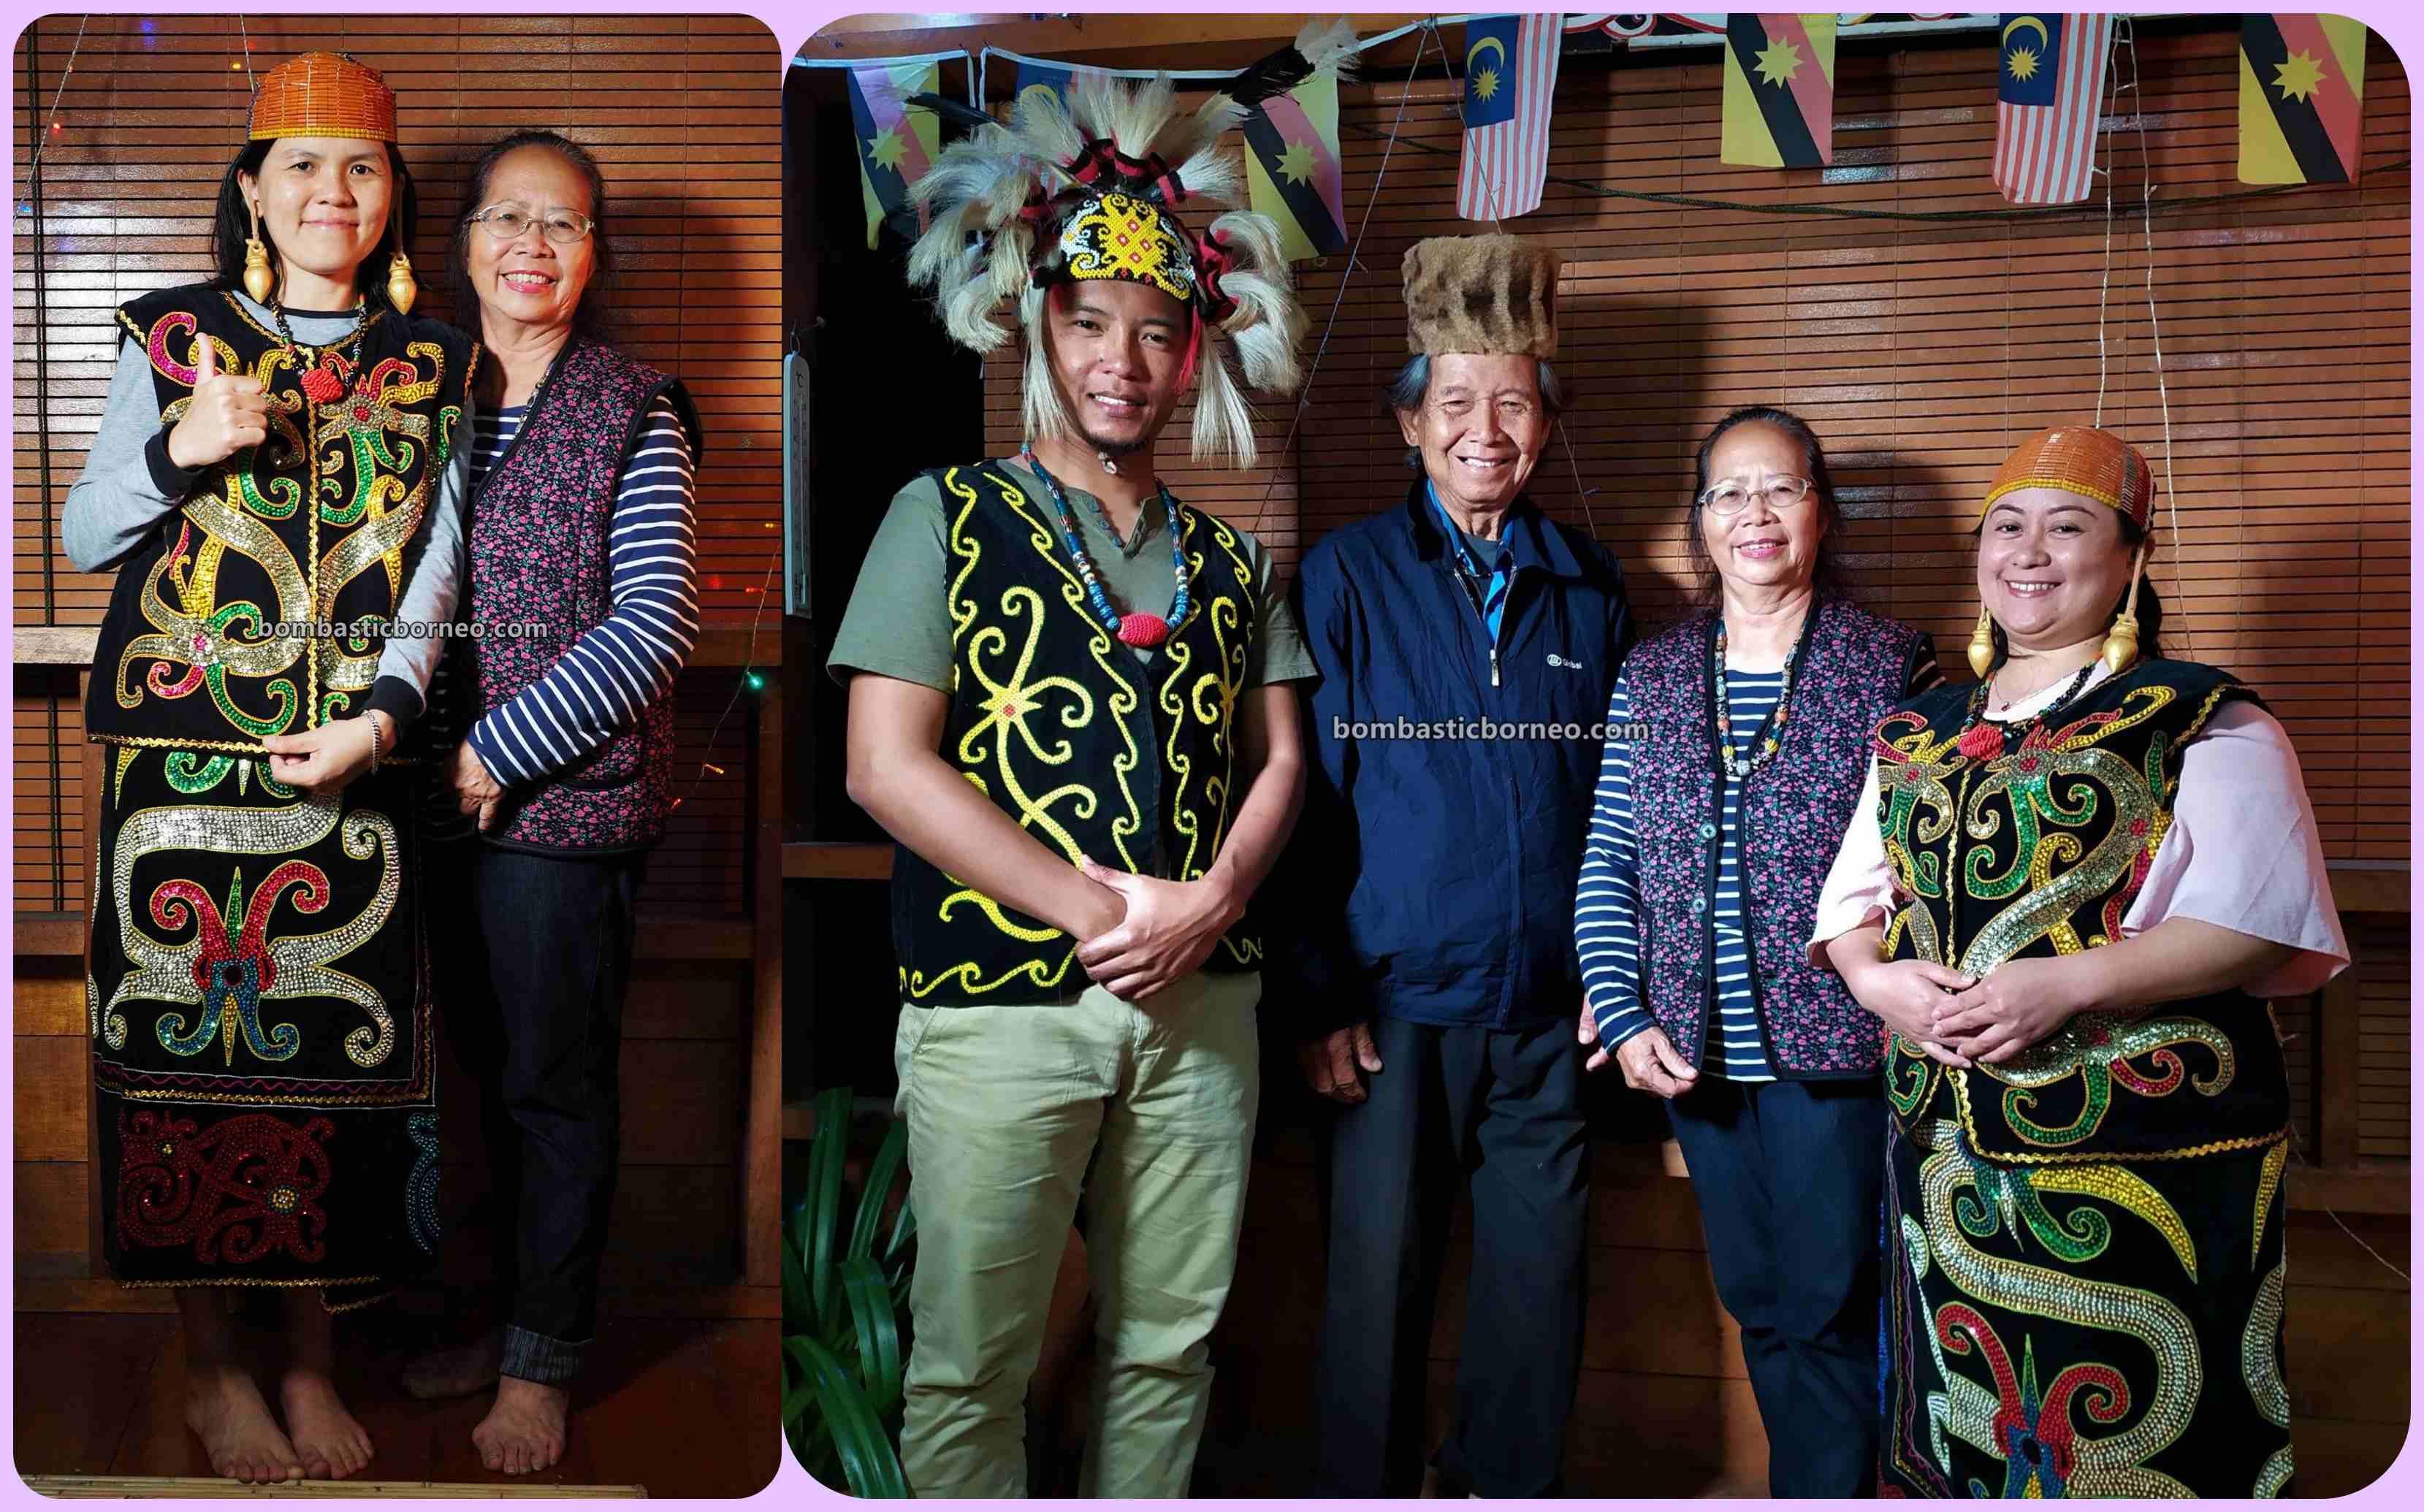 Kelabit Highlands, tribe, tribal, backpackers, traditional, culture, Interior village, Malaysia, Dayak, native, travel, Borneo, 马来西亚高原民宿, 砂拉越原住民达雅, 巴里奥乌鲁人部落,